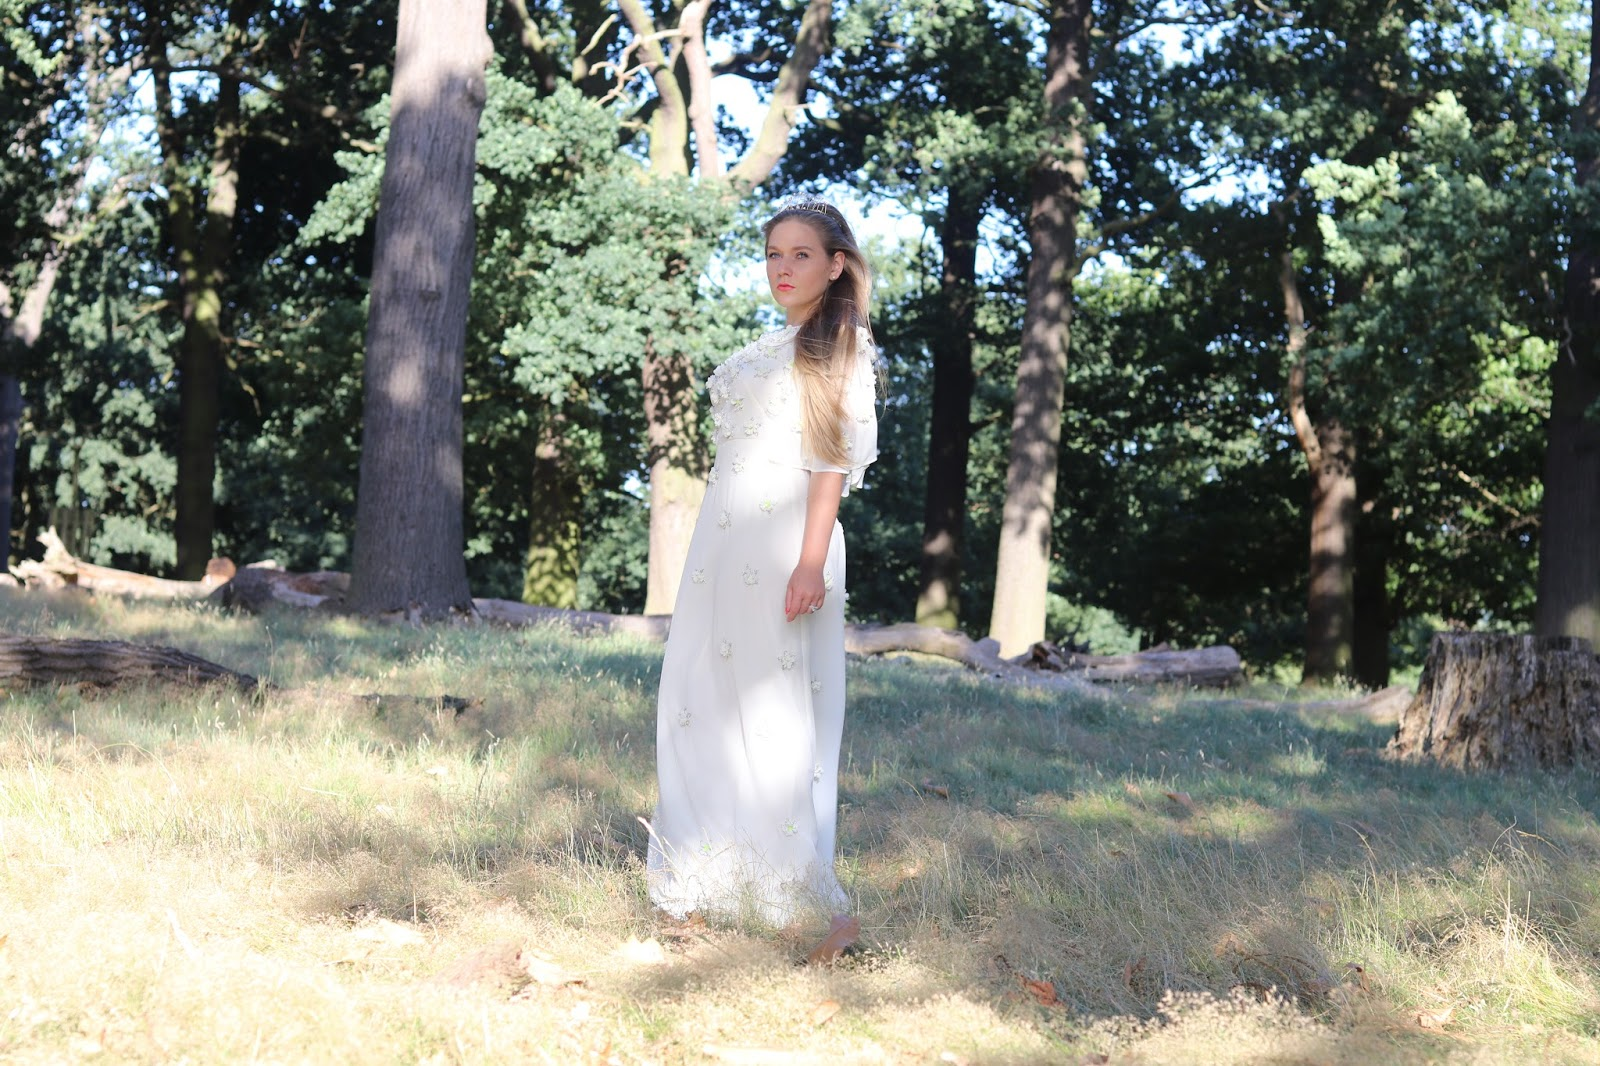 Katie Heath wearing Tiara and ASOS Wedding Dress in Richmond Park, London